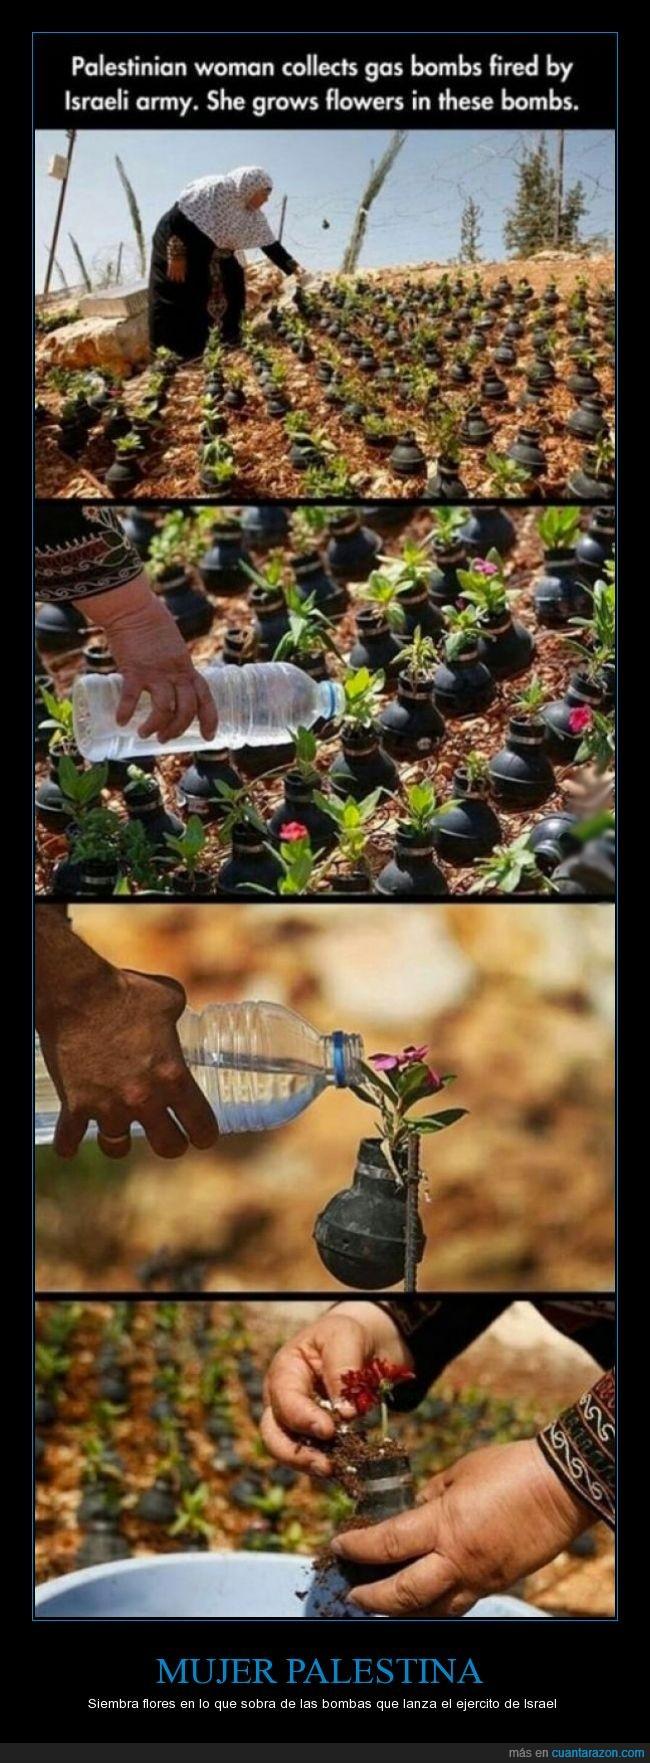 bomba,casquillo,flor,gaza,guerra,guerra de libro,Israel,planta,plantar,resistir